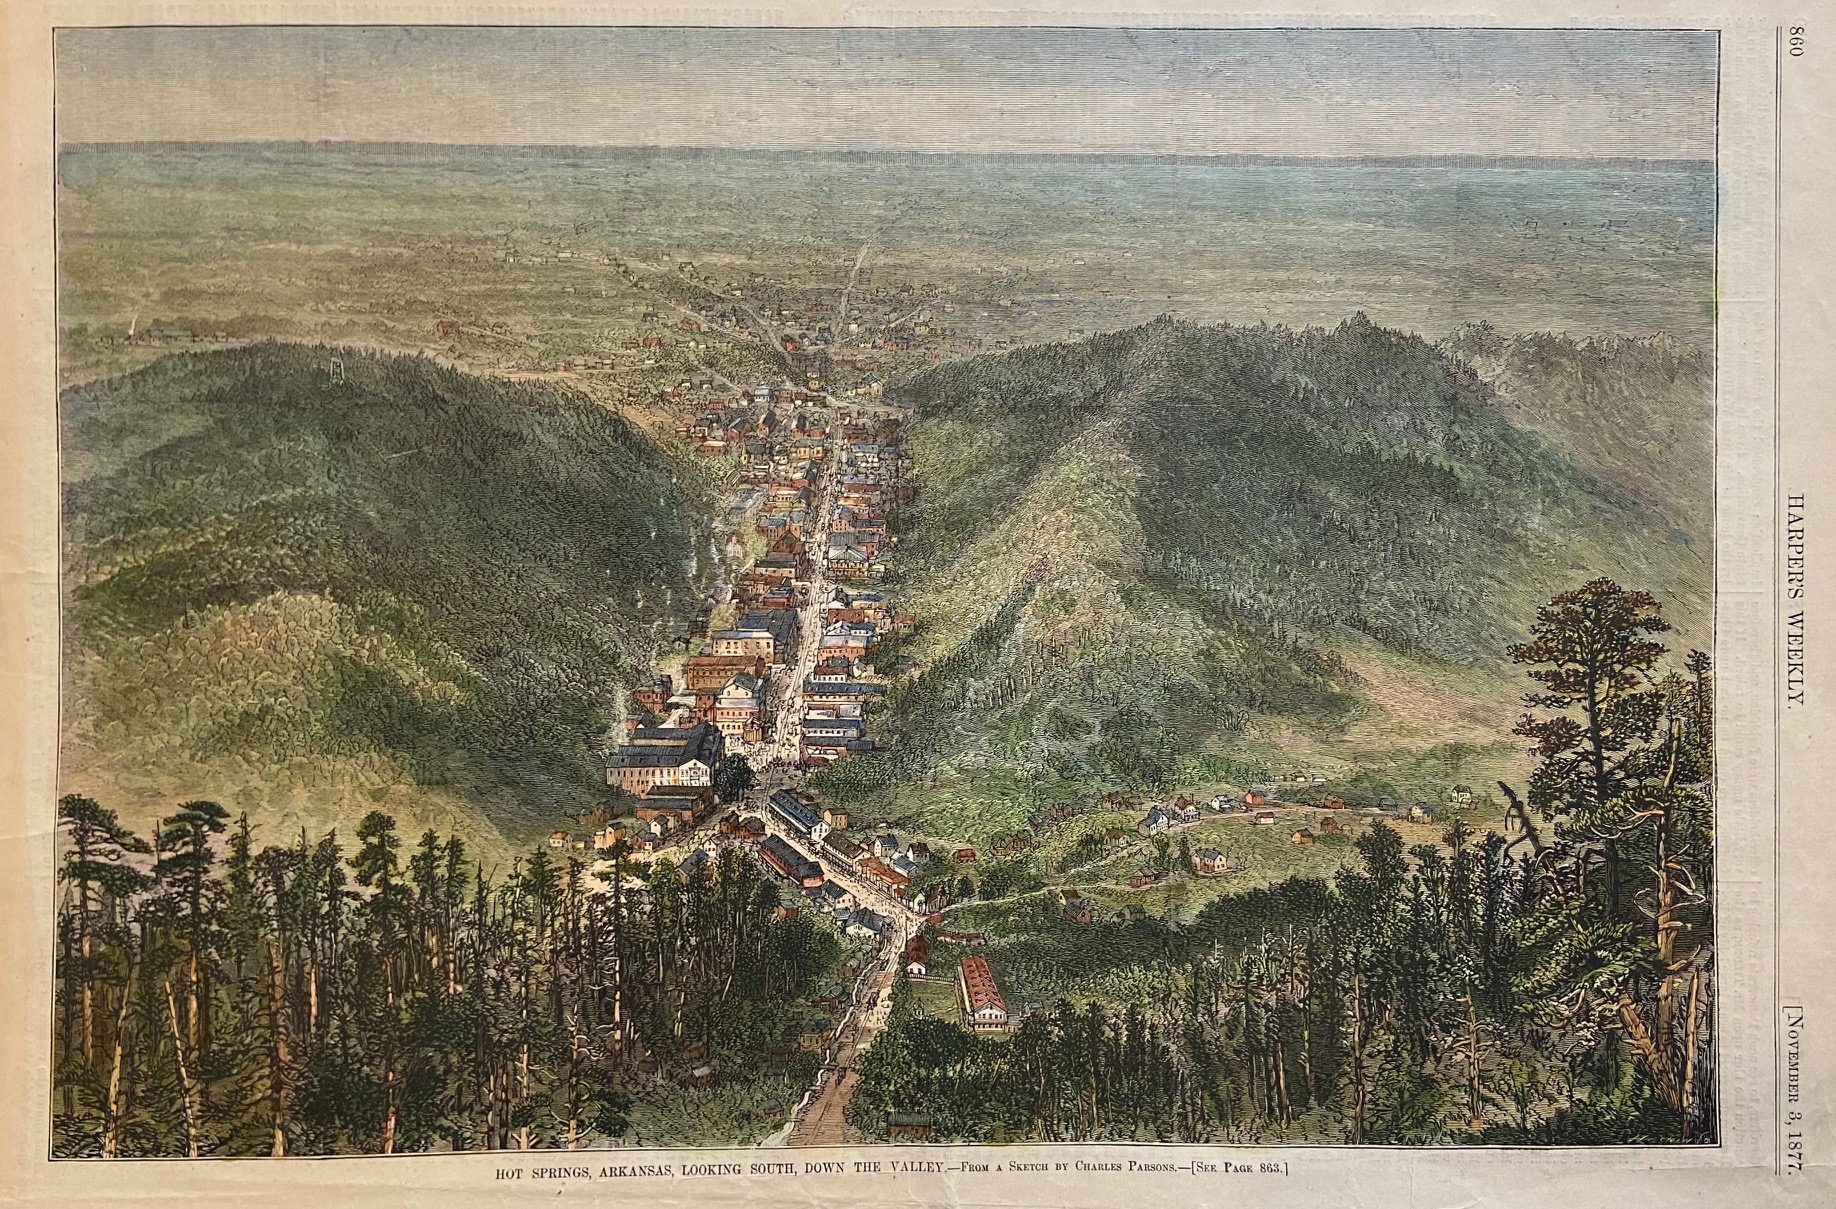 Hot Springs, Arkansas, Looking South, Down the: HARPER'S WEEKLY